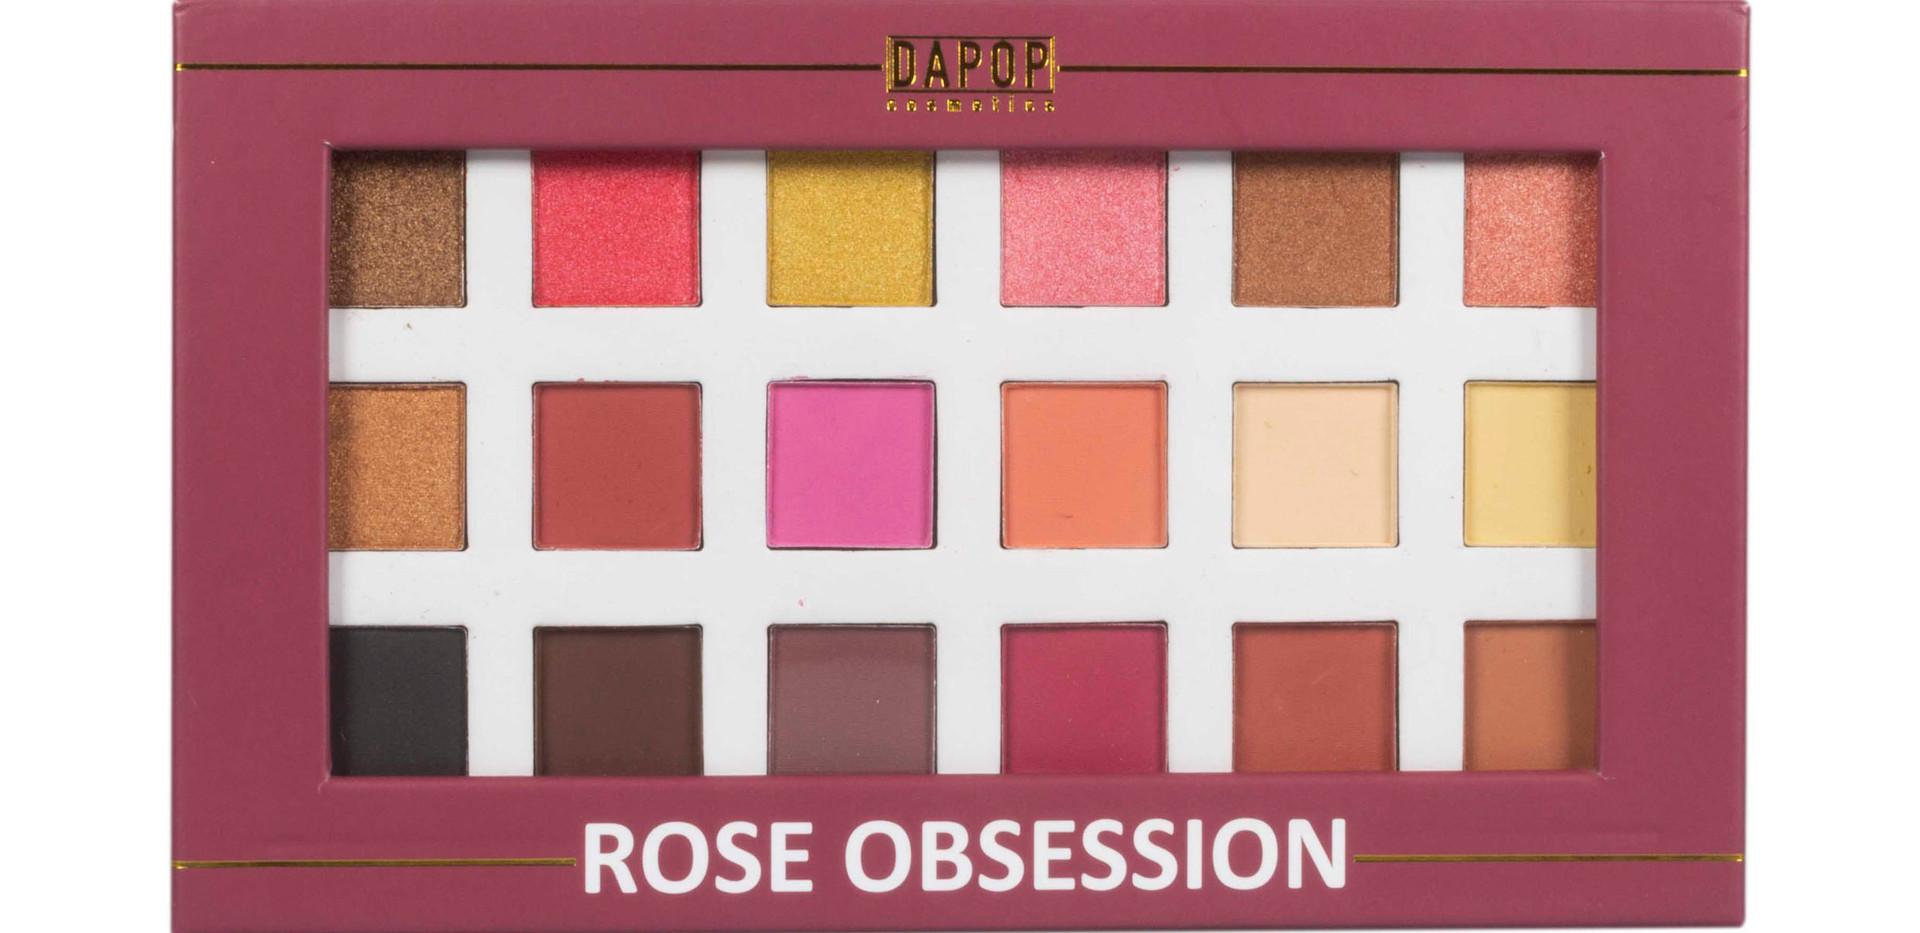 Paleta de Sombras Rose Obsession Dapop - HB96965